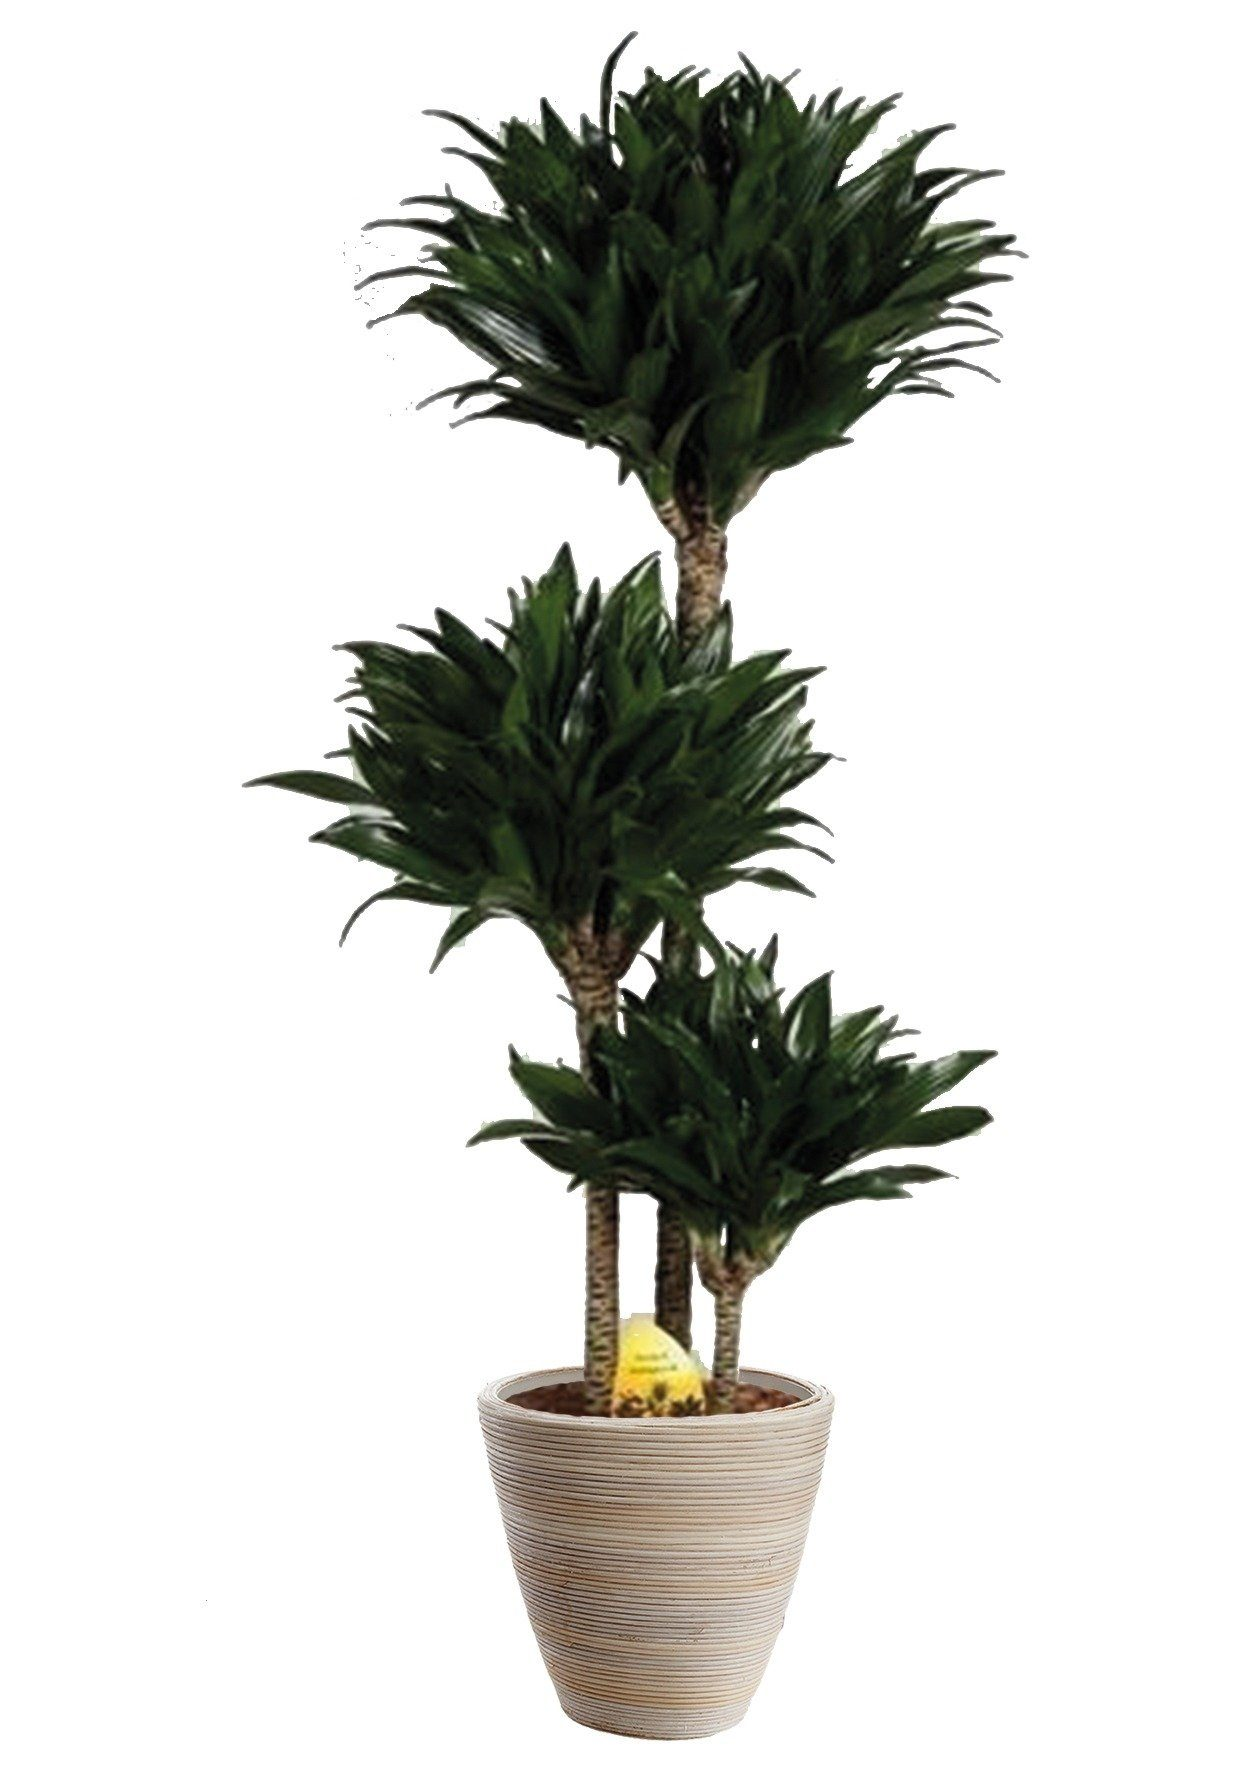 Zimmerpflanze »Drachenbaum Compacta«, 100 cm